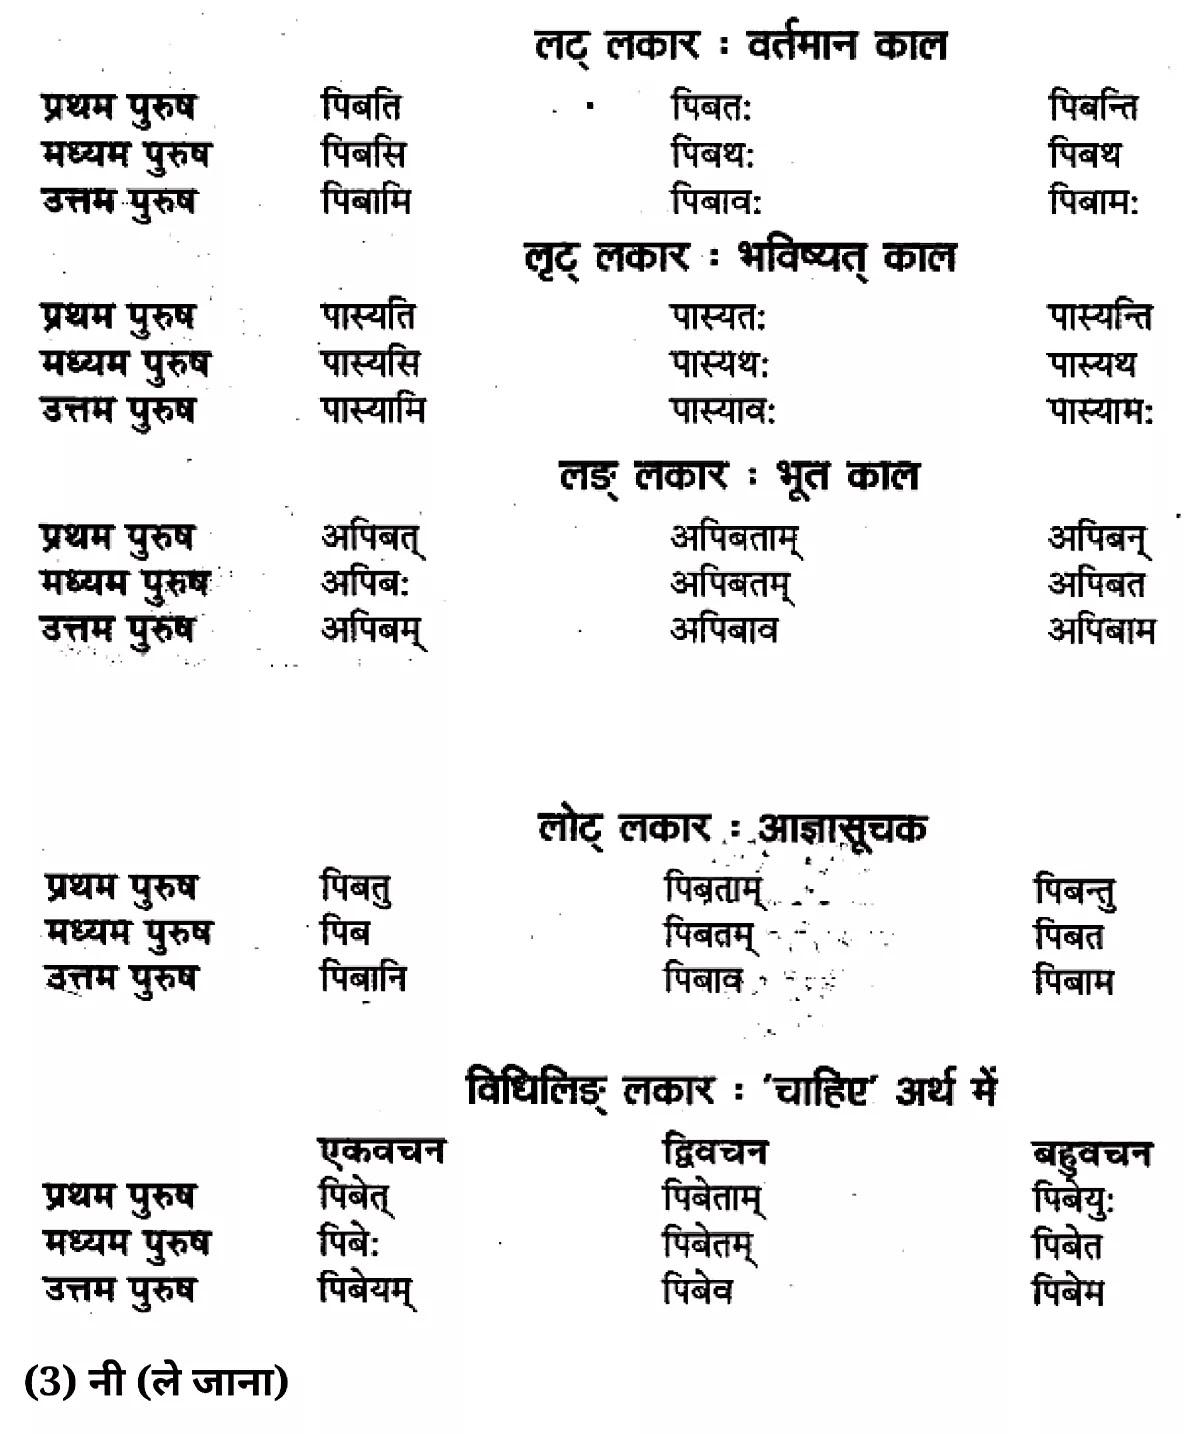 कक्षा 11 साहित्यिक हिंदीधातु-रूप-प्रकरण  के नोट्स साहित्यिक हिंदी में एनसीईआरटी समाधान,   class 11 sahityik hindi dhaatu-roop-prakaran,  class 11 sahityik hindi dhaatu-roop-prakaran ncert solutions in sahityik hindi,  class 11 sahityik hindi dhaatu-roop-prakaran notes in sahityik hindi,  class 11 sahityik hindi dhaatu-roop-prakaran question answer,  class 11 sahityik hindi dhaatu-roop-prakaran notes,  11   class dhaatu-roop-prakaran in sahityik hindi,  class 11 sahityik hindi dhaatu-roop-prakaran in sahityik hindi,  class 11 sahityik hindi dhaatu-roop-prakaran important questions in sahityik hindi,  class 11 sahityik hindi  dhaatu-roop-prakaran notes in sahityik hindi,  class 11 sahityik hindi dhaatu-roop-prakaran test,  class 11 sahityik hindi dhaatu-roop-prakaran pdf,  class 11 sahityik hindi dhaatu-roop-prakaran notes pdf,  class 11 sahityik hindi dhaatu-roop-prakaran exercise solutions,  class 11 sahityik hindi dhaatu-roop-prakaran, class 11 sahityik hindi dhaatu-roop-prakaran notes study rankers,  class 11 sahityik hindi dhaatu-roop-prakaran notes,  class 11 sahityik hindi  dhaatu-roop-prakaran notes,   dhaatu-roop-prakaran 11  notes pdf, dhaatu-roop-prakaran class 11  notes  ncert,  dhaatu-roop-prakaran class 11 pdf,   dhaatu-roop-prakaran  book,    dhaatu-roop-prakaran quiz class 11  ,       11  th dhaatu-roop-prakaran    book up board,       up board 11  th dhaatu-roop-prakaran notes,  कक्षा 11 साहित्यिक हिंदीधातु-रूप-प्रकरण , कक्षा 11 साहित्यिक हिंदी का धातु-रूप-प्रकरण , कक्षा 11 साहित्यिक हिंदी के धातु-रूप-प्रकरण  के नोट्स हिंदी में, कक्षा 11 का साहित्यिक हिंदीधातु-रूप-प्रकरण का प्रश्न उत्तर, कक्षा 11 साहित्यिक हिंदीधातु-रूप-प्रकरण के नोट्स, 11 कक्षा साहित्यिक हिंदीधातु-रूप-प्रकरण   साहित्यिक हिंदी में, कक्षा 11 साहित्यिक हिंदीधातु-रूप-प्रकरण हिंदी में, कक्षा 11 साहित्यिक हिंदीधातु-रूप-प्रकरण  महत्वपूर्ण प्रश्न हिंदी में, कक्षा 11 के साहित्यिक हिंदी के नोट्स हिंदी में,साहित्यिक हिंदी कक्षा 11 नोट्स pdf,  साहित्यिक हिंदी  कक्षा 11 नोट्स 2021 ncert,  साहित्य